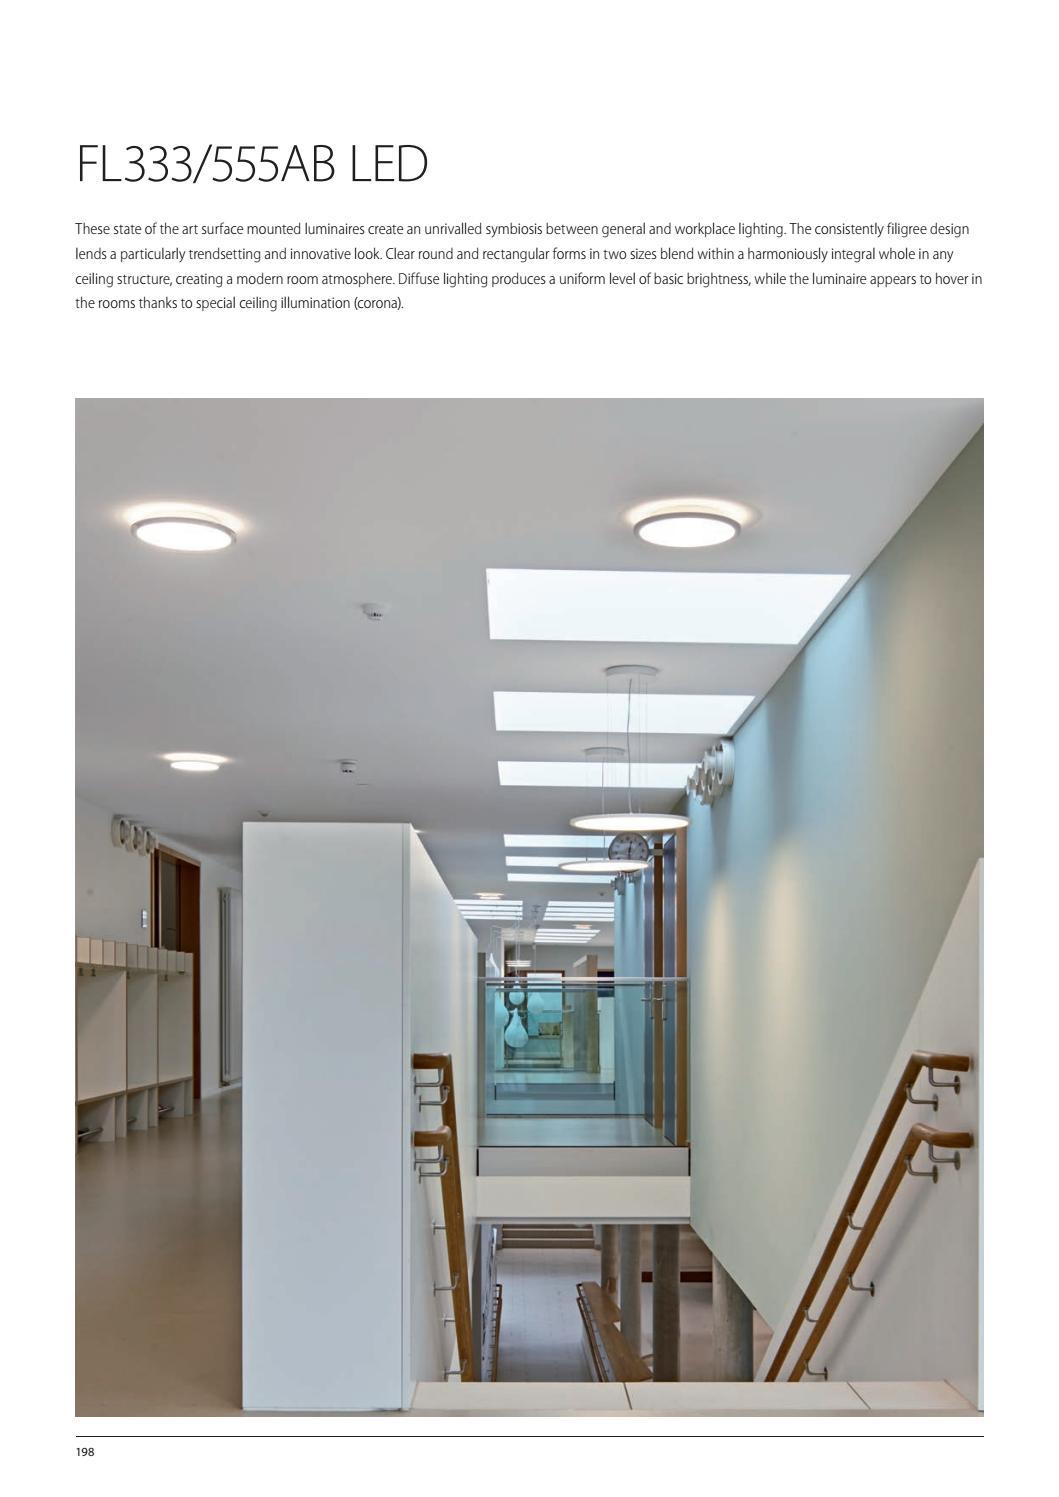 Prisma Indoor Lighting 2017 by KES Lighting - issuu